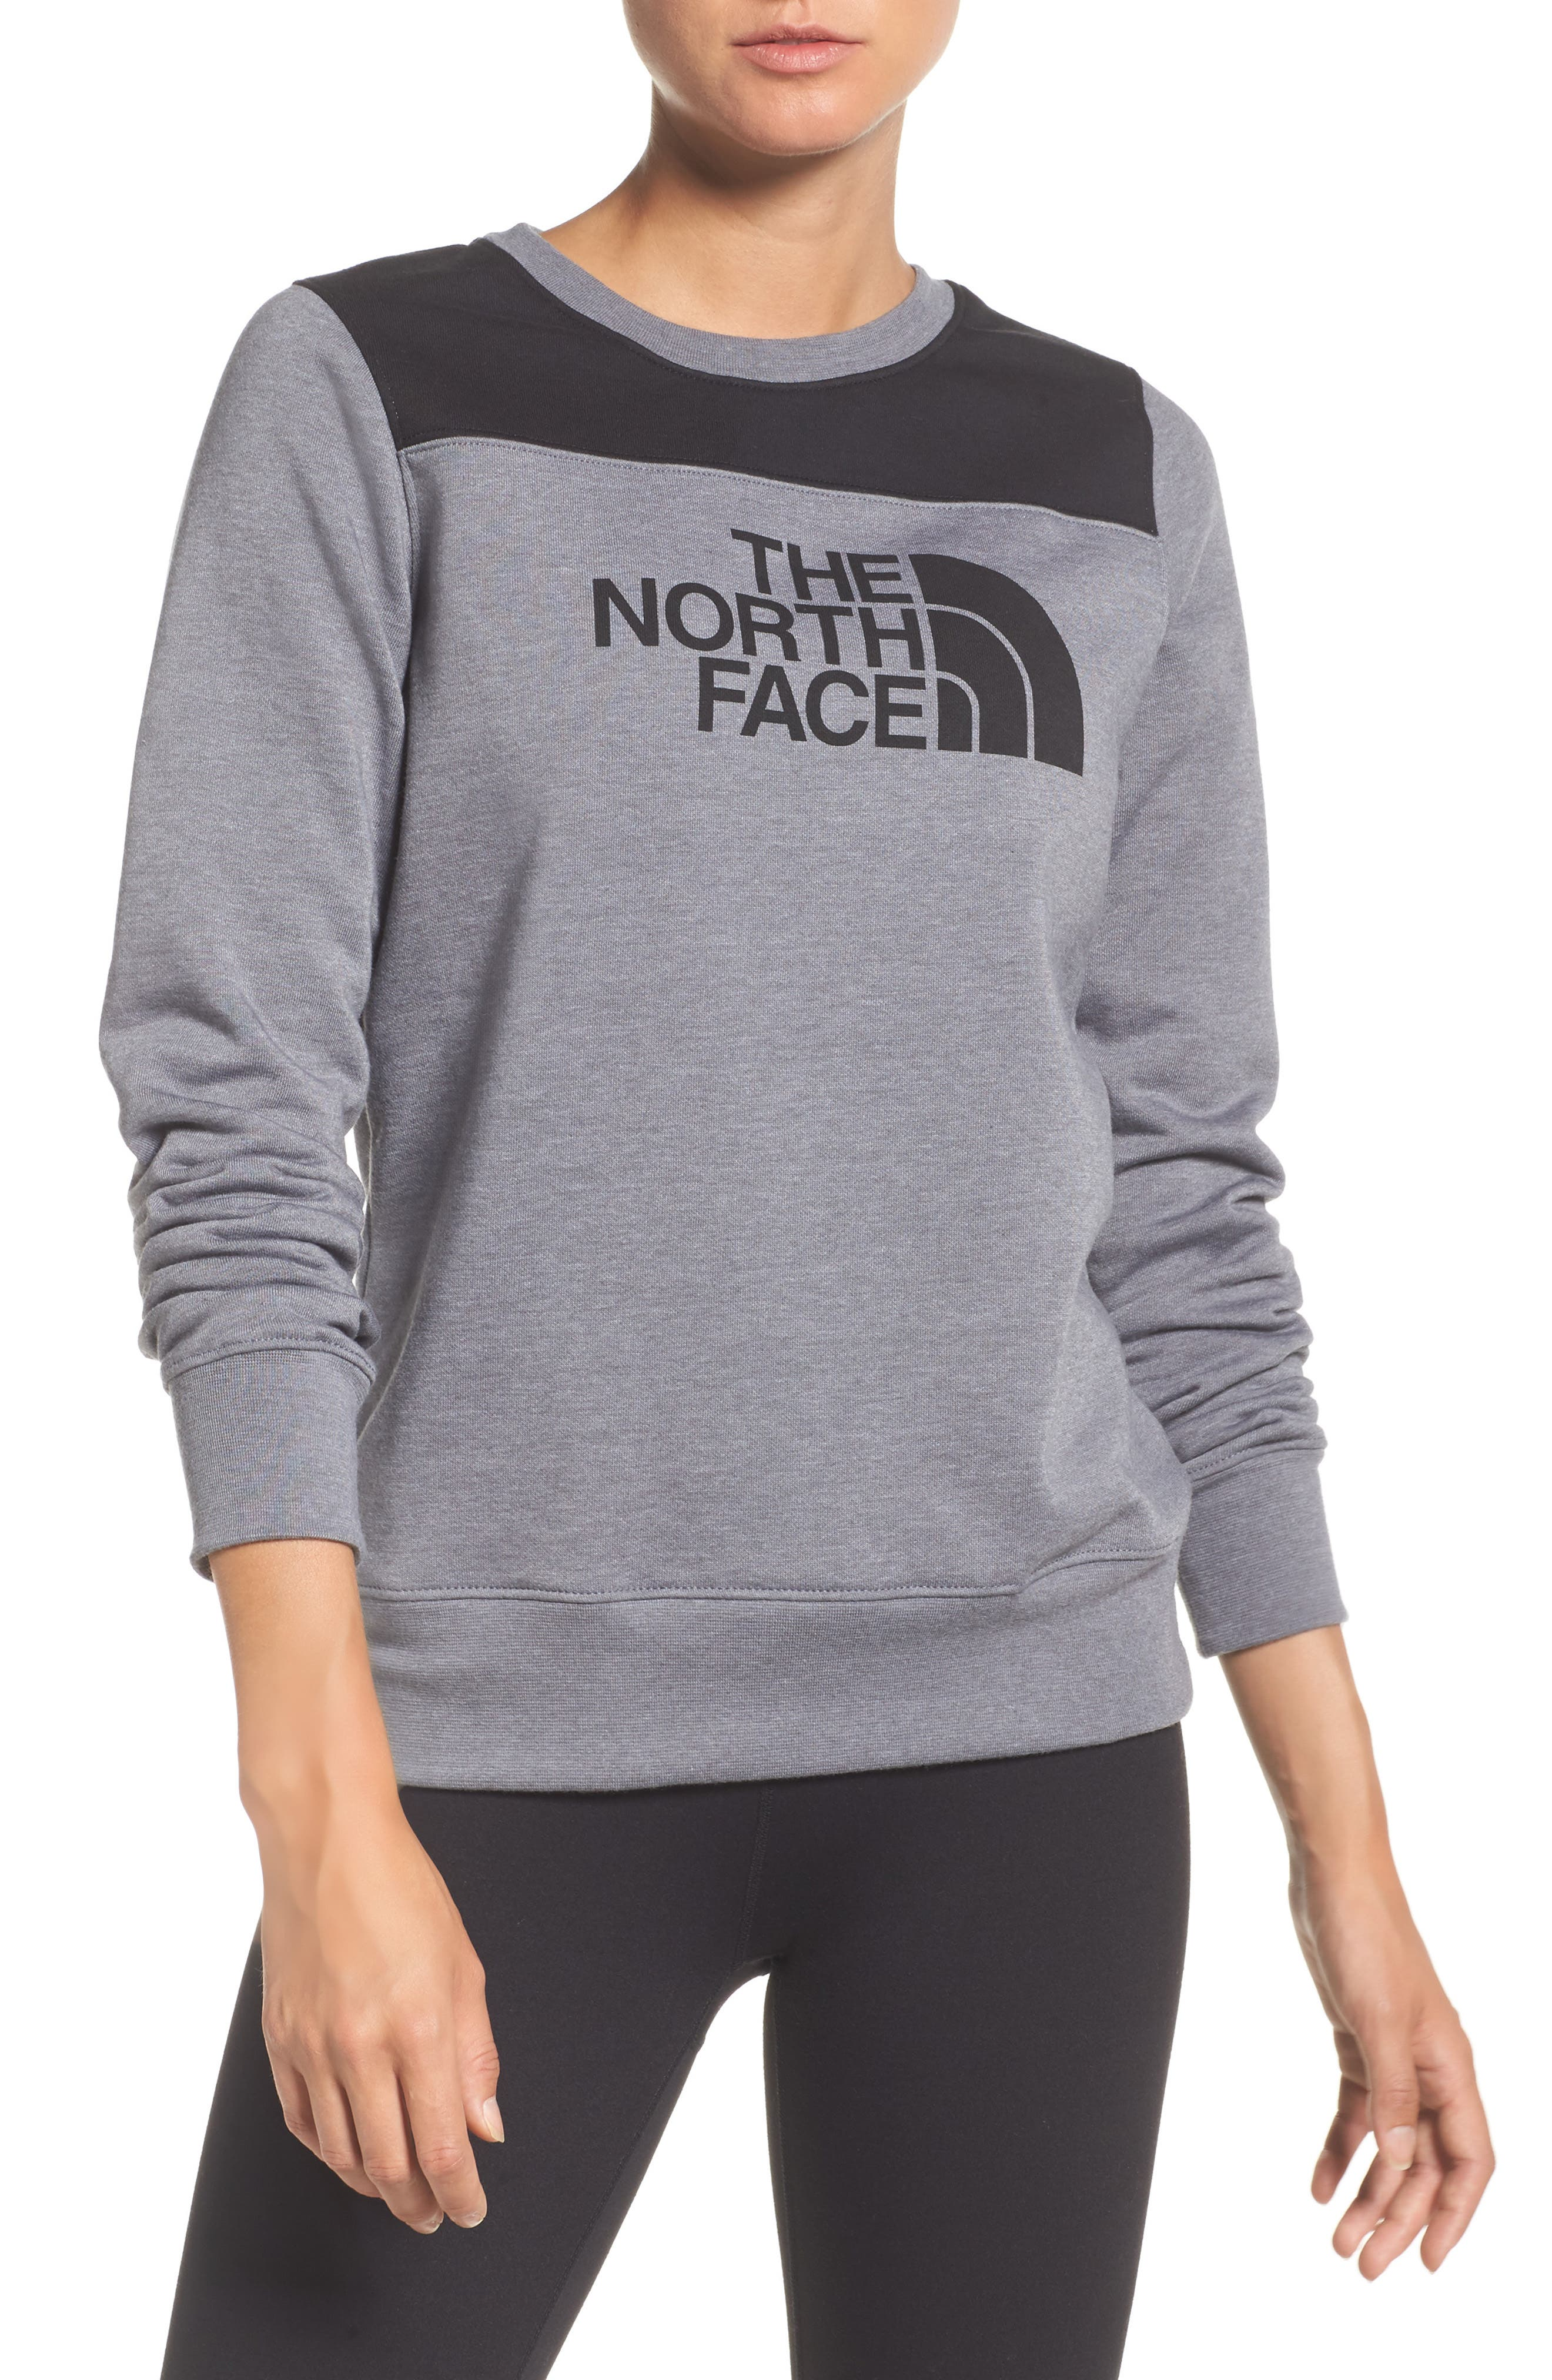 The North Face Half Dome Sweatshirt